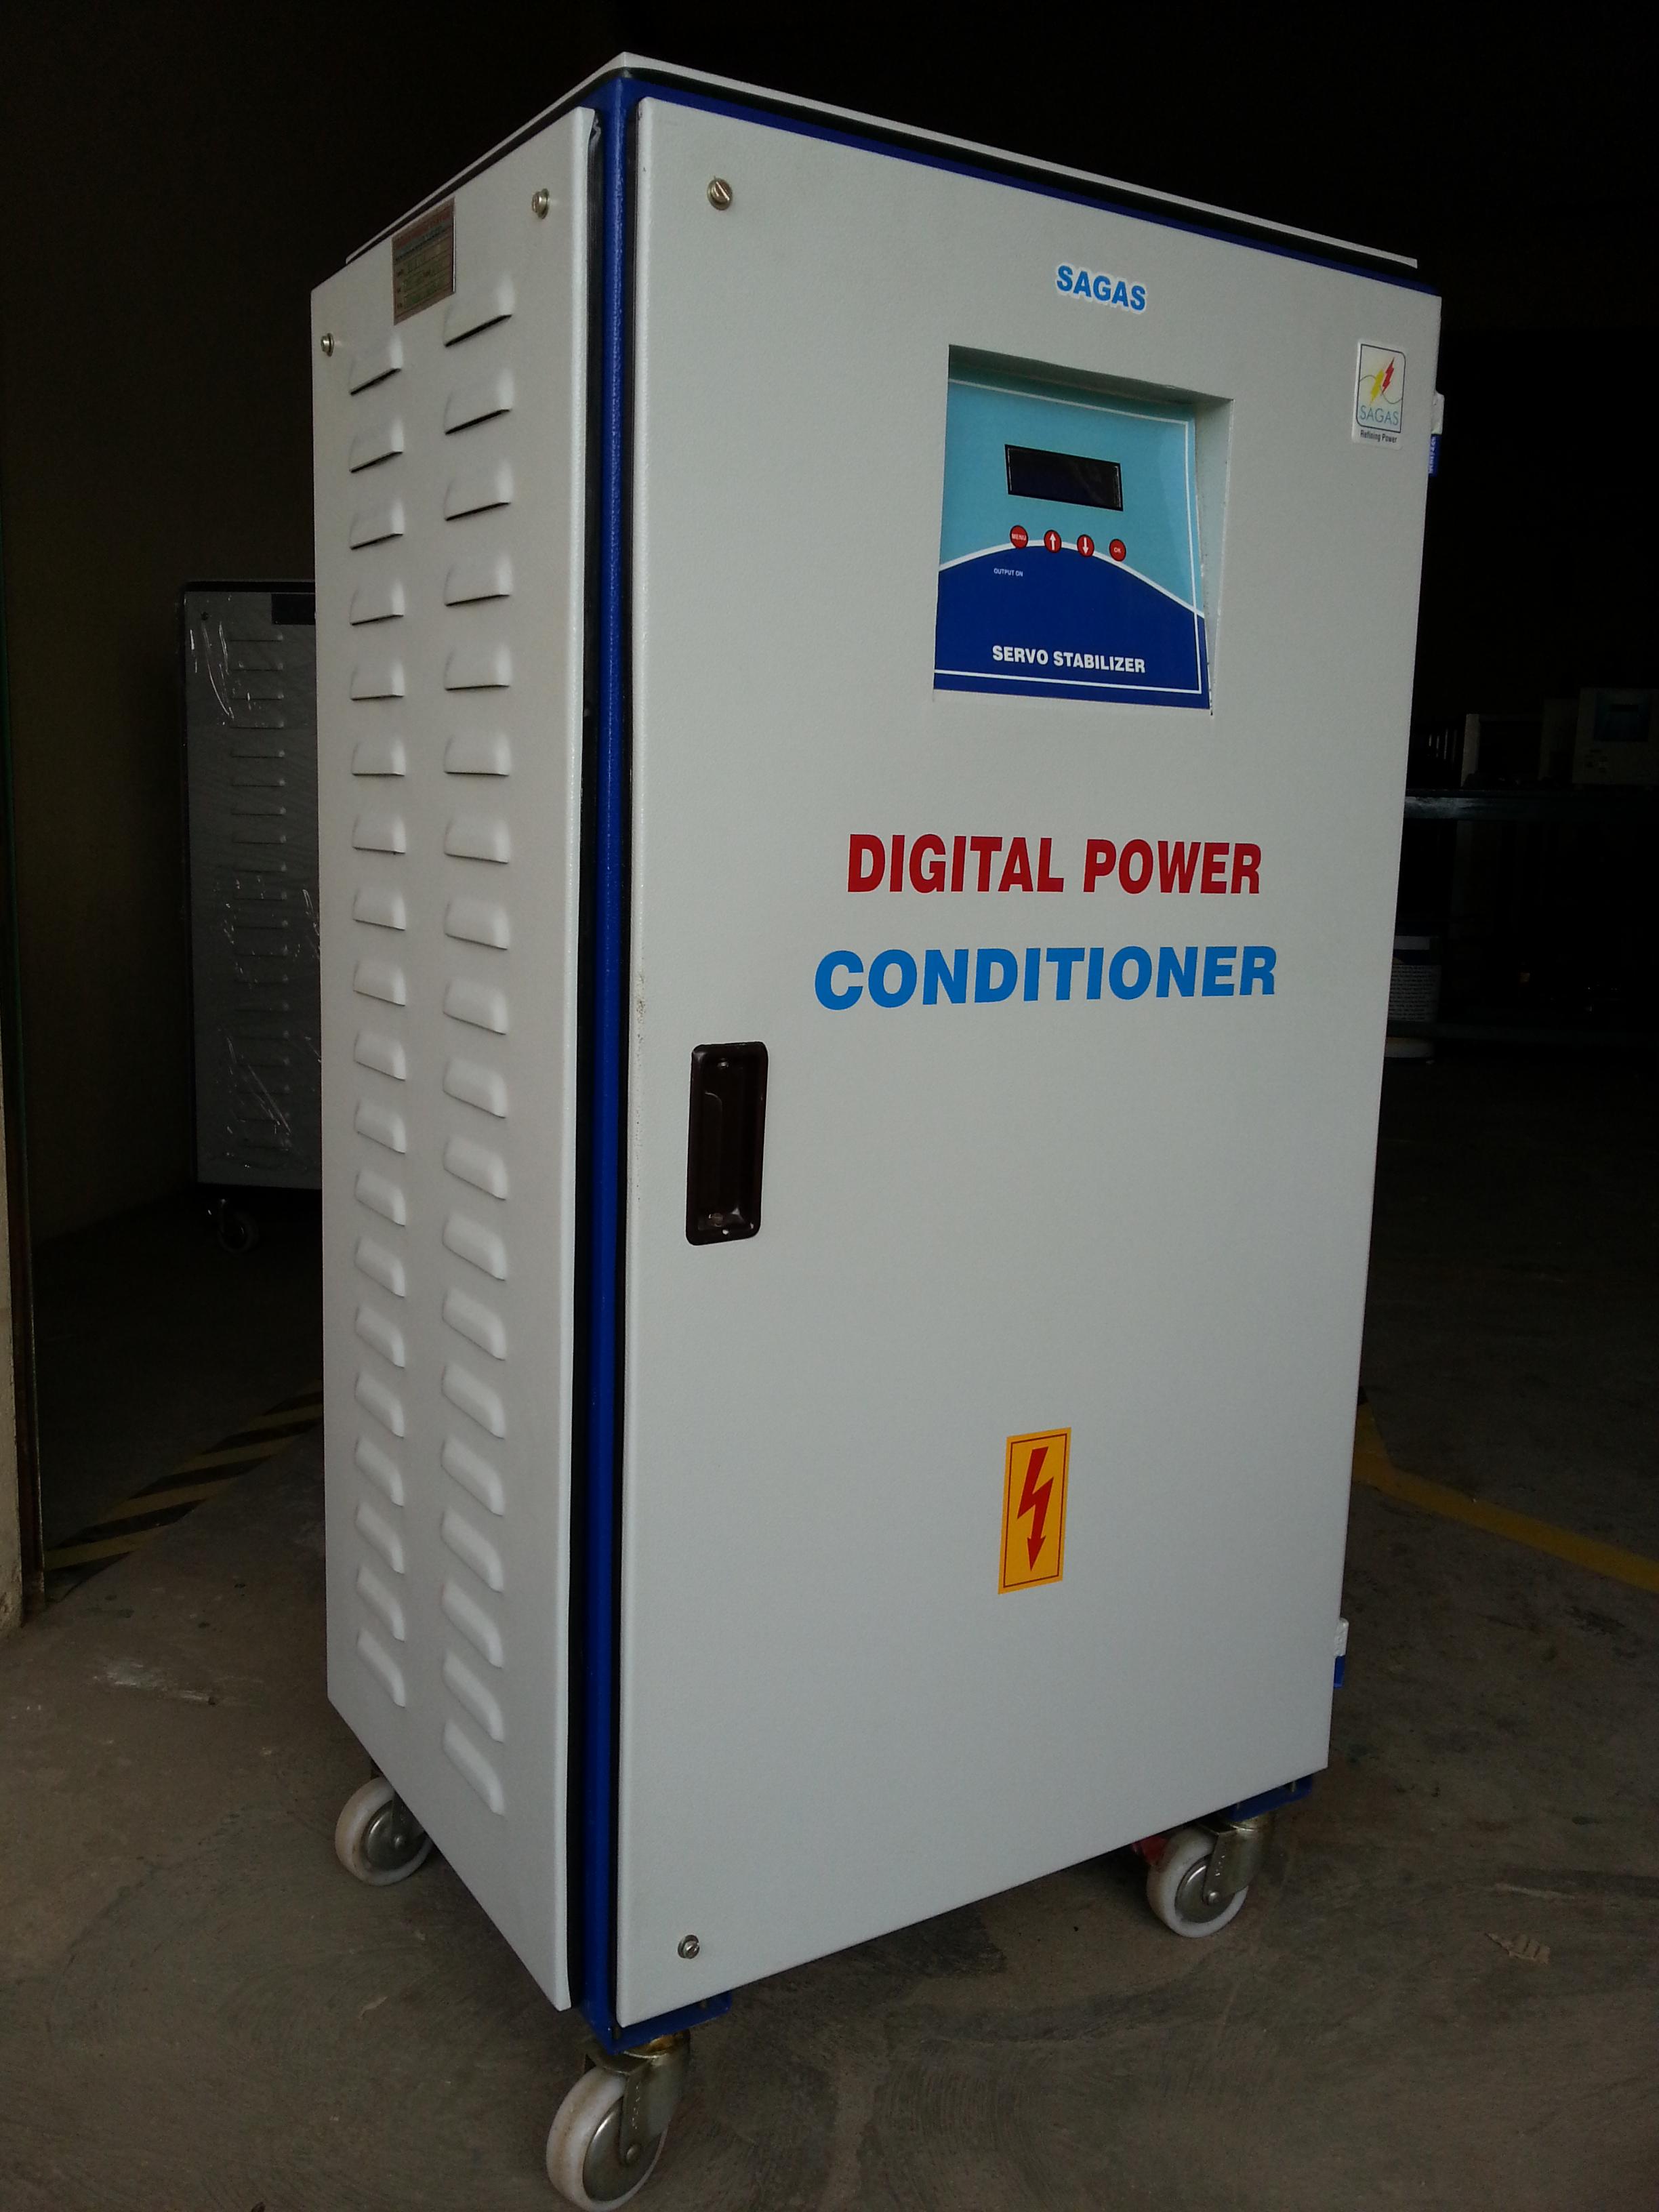 sagas power system